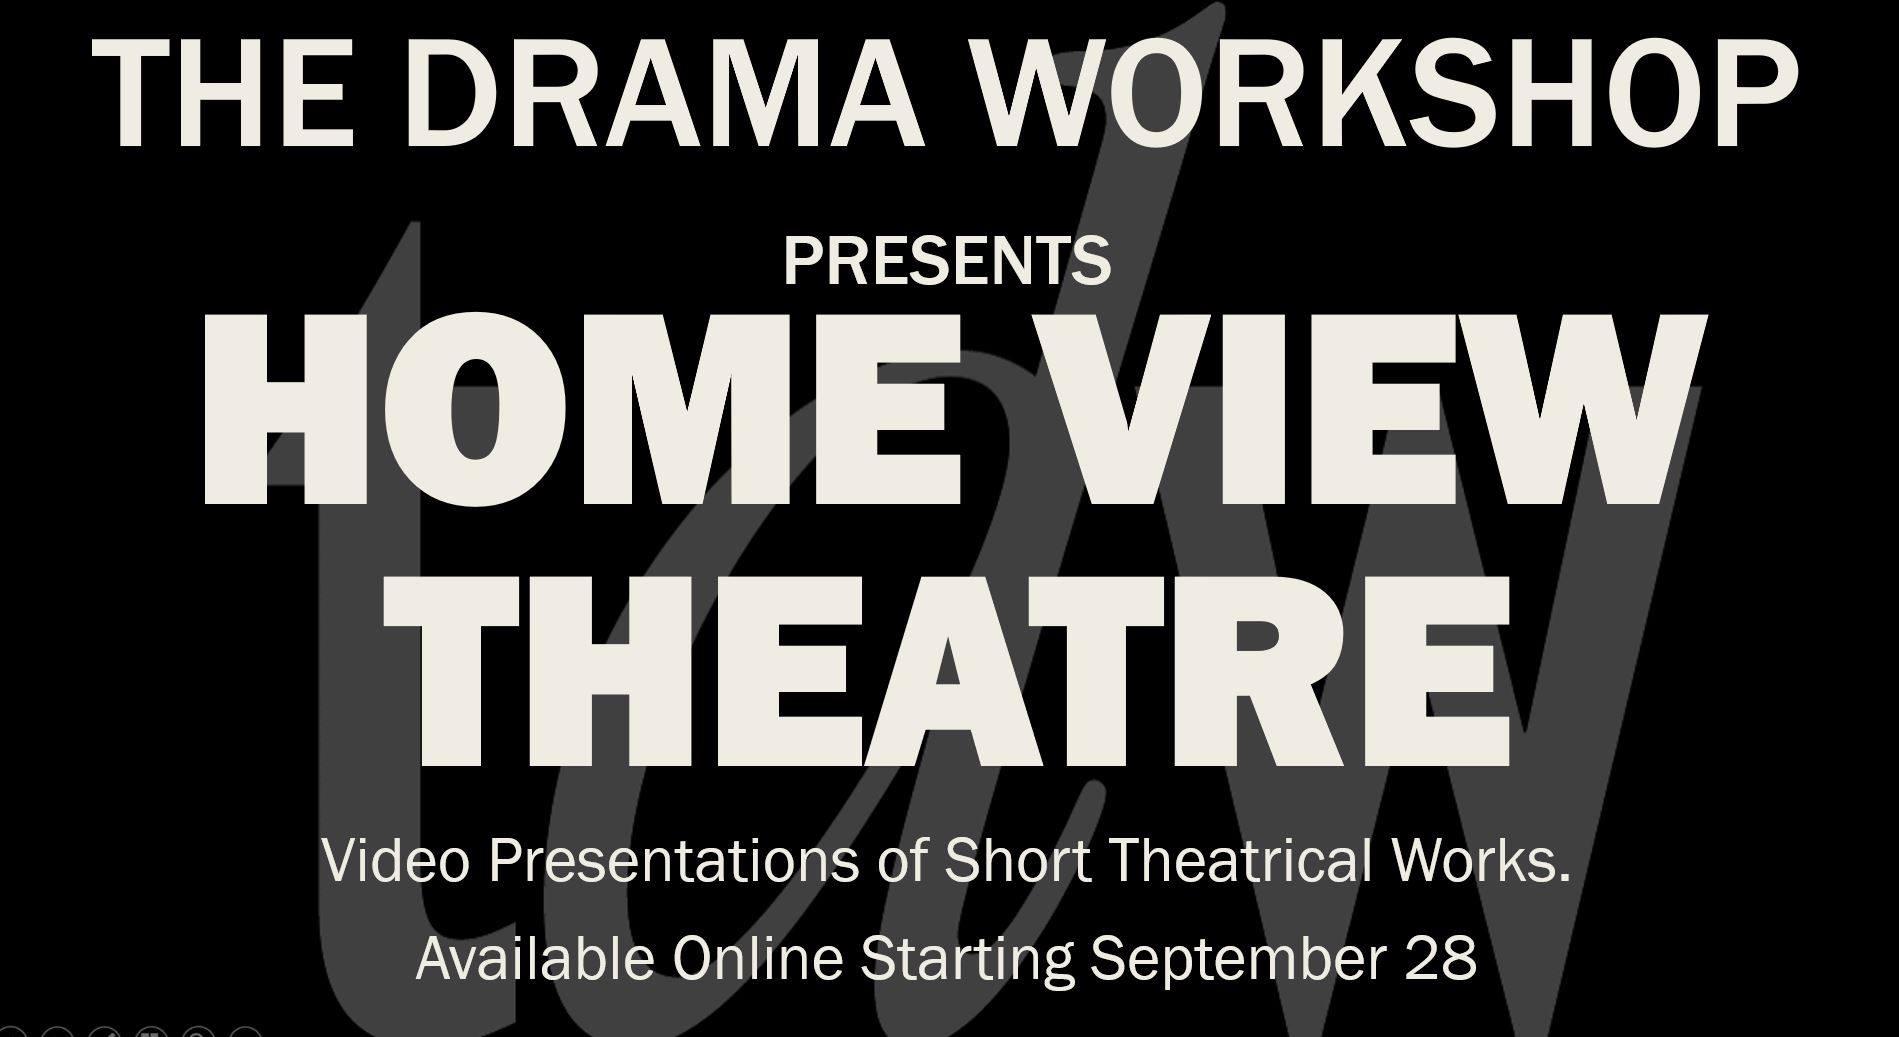 TDW_Home View Theatre logo